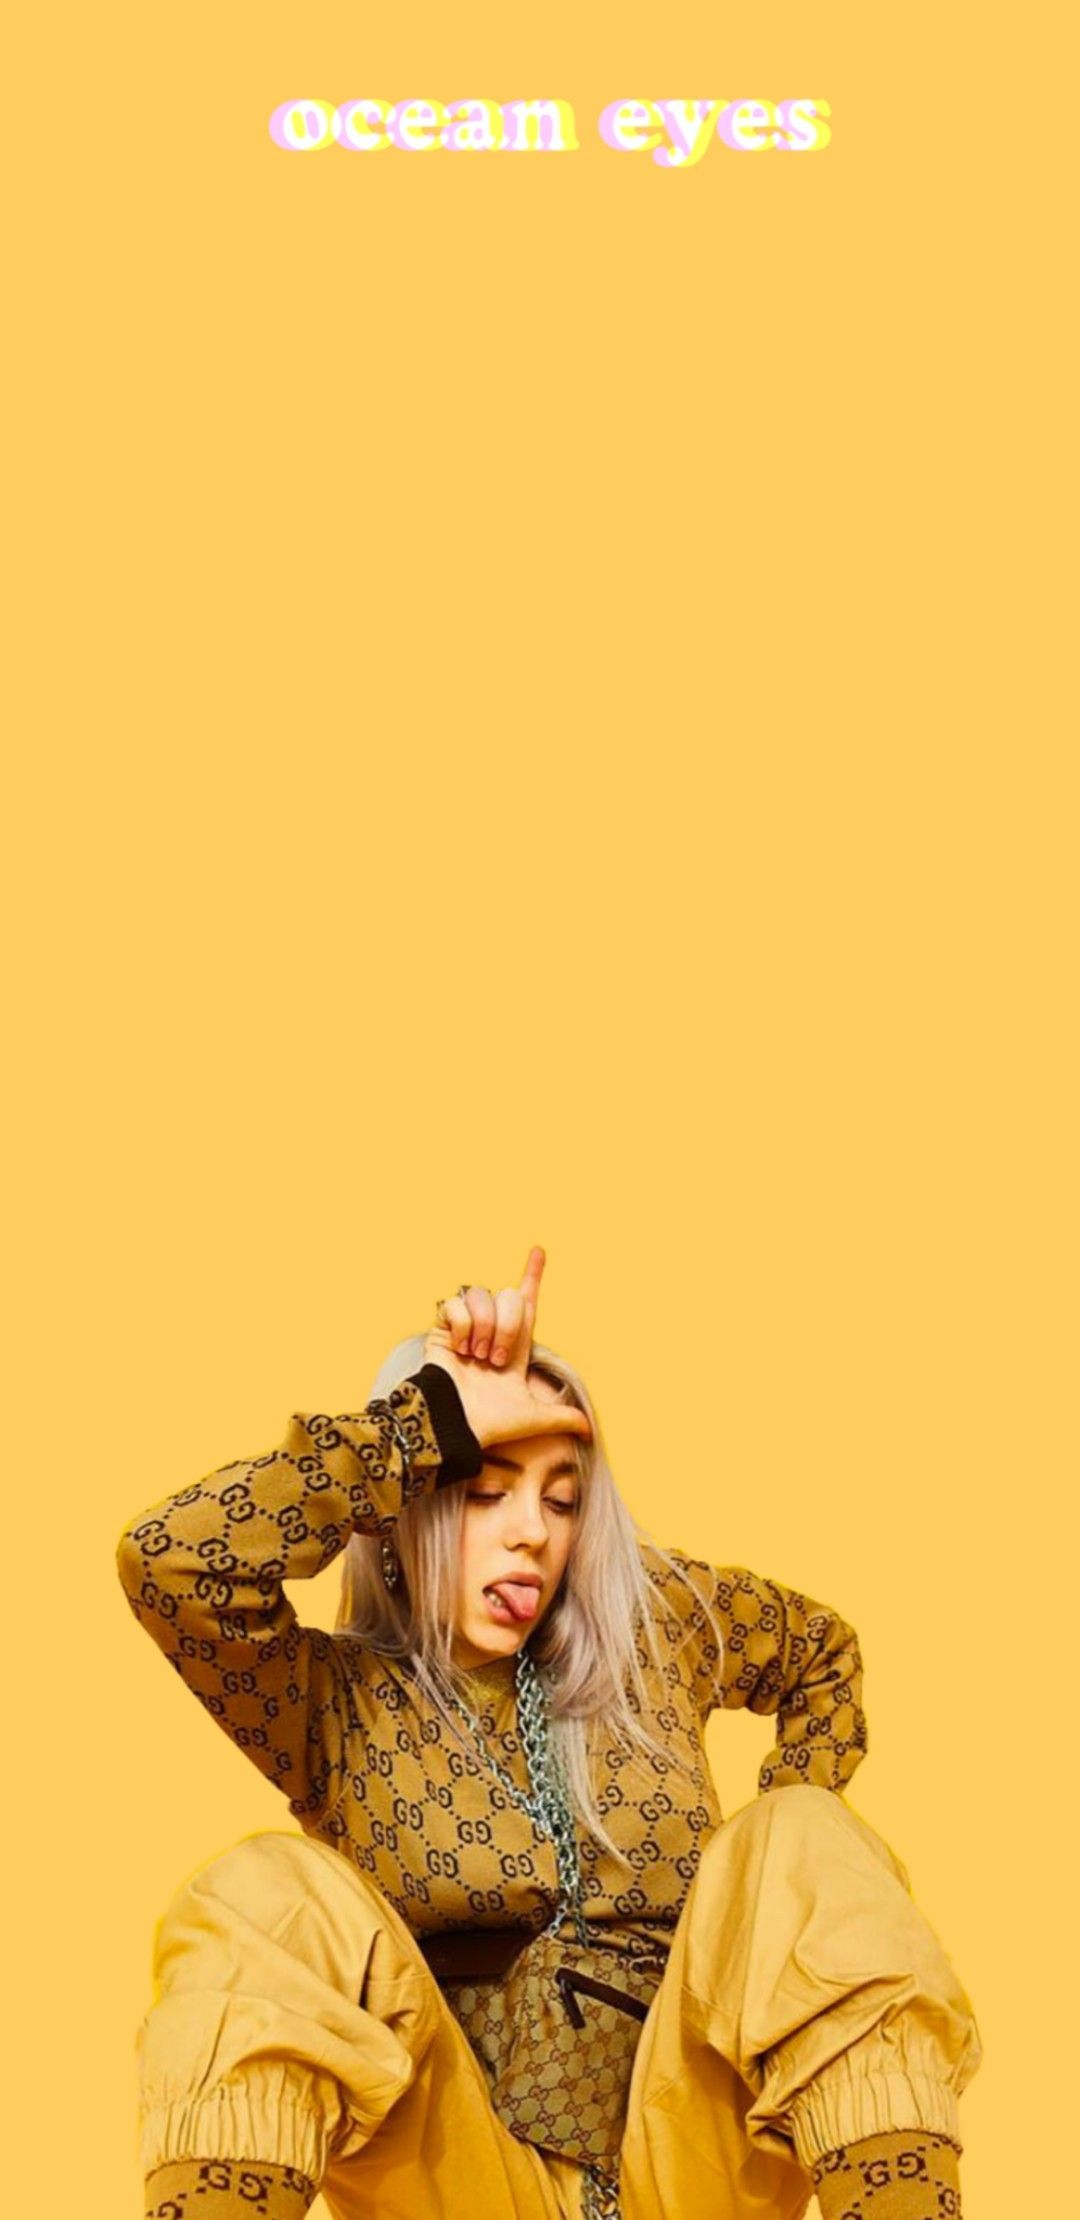 Yellow Amarelo Fan Billie Eilish Background Wallpaper Plano